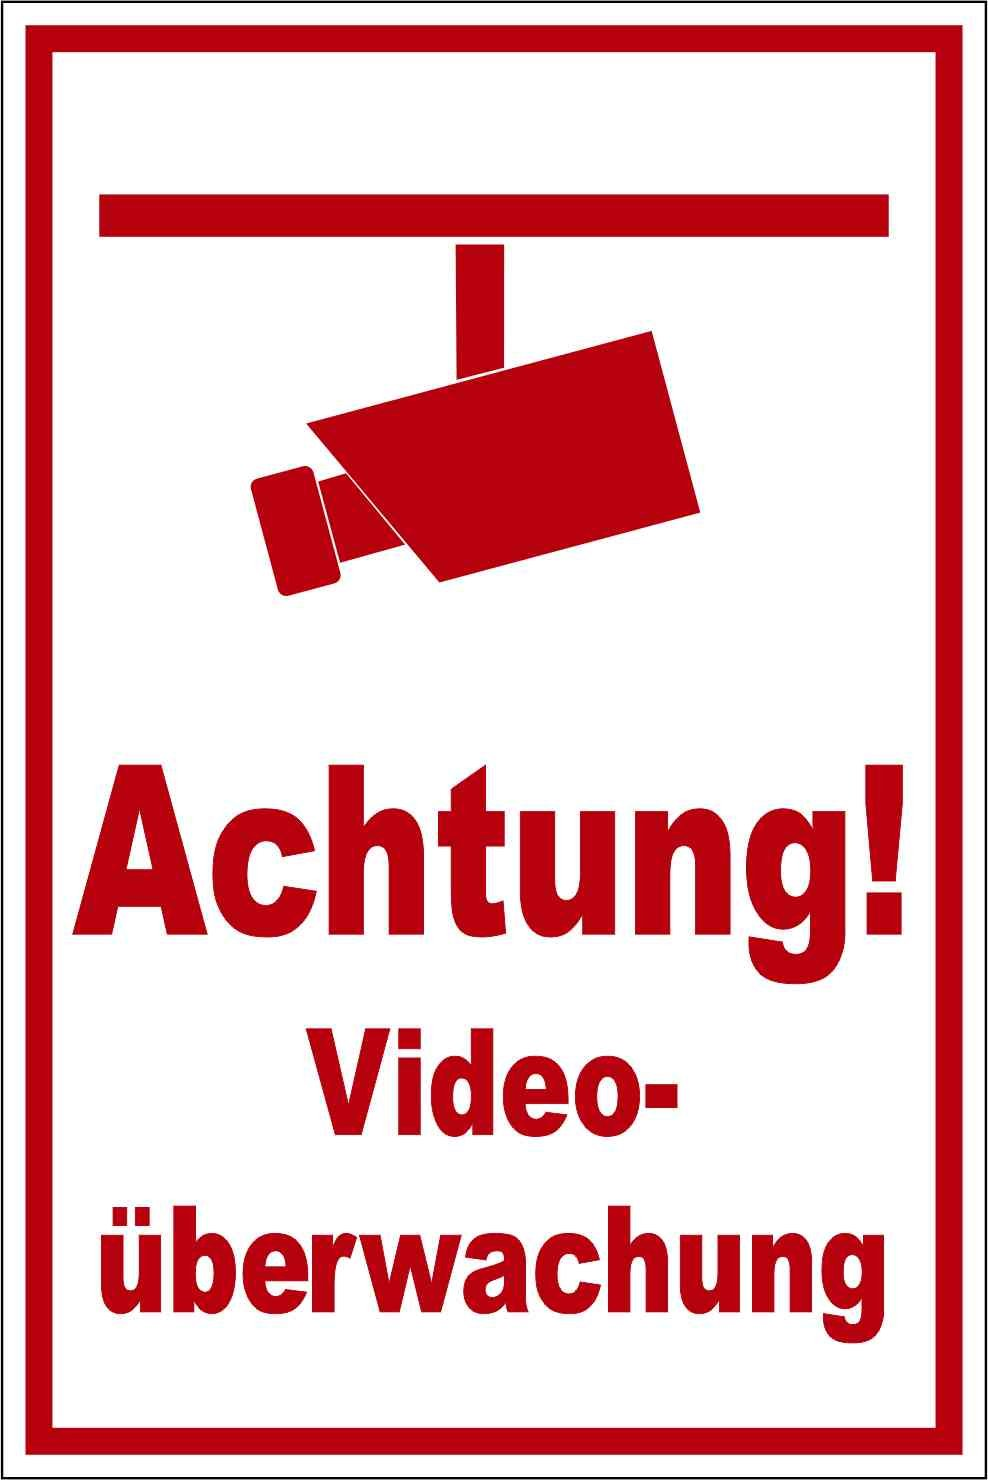 Kleberio® Warnschild 30 x 20 cm - Achtung! - stabile Aluminiumverbundplatte